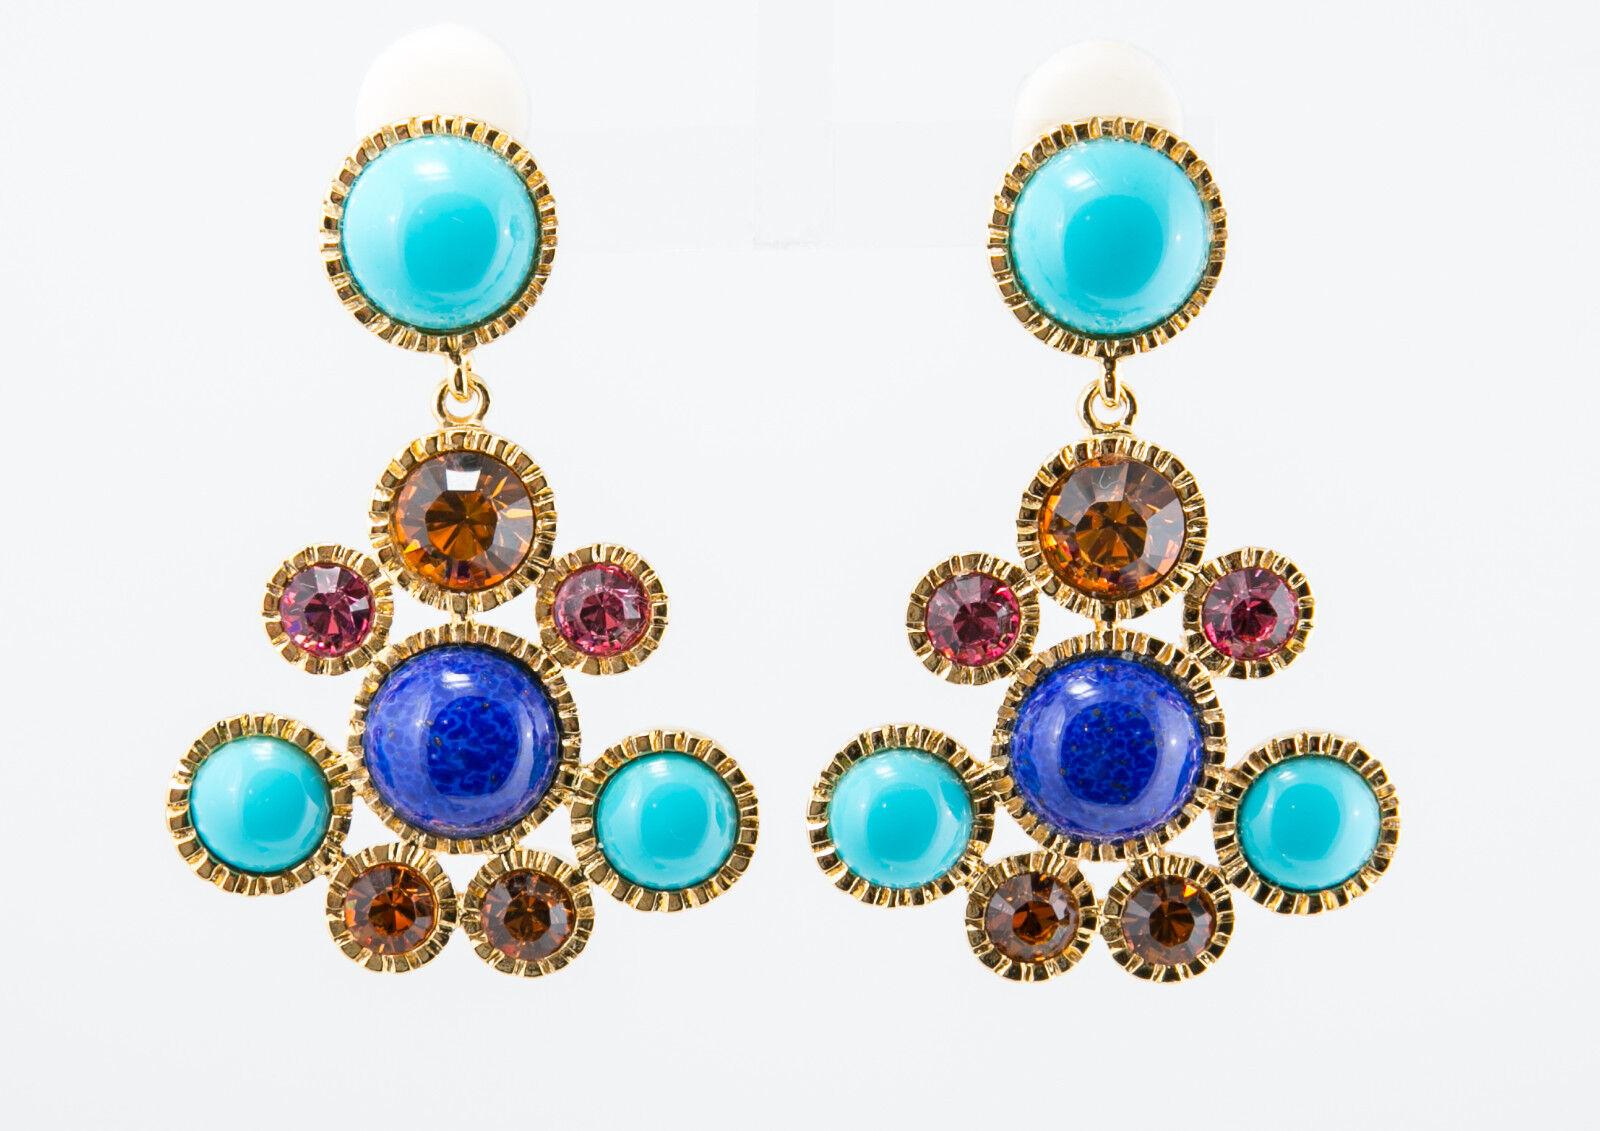 Kenneth Jay Lane Glamour Lapiz Turquoise Pastel Cluster Drop Chandelier Earrings